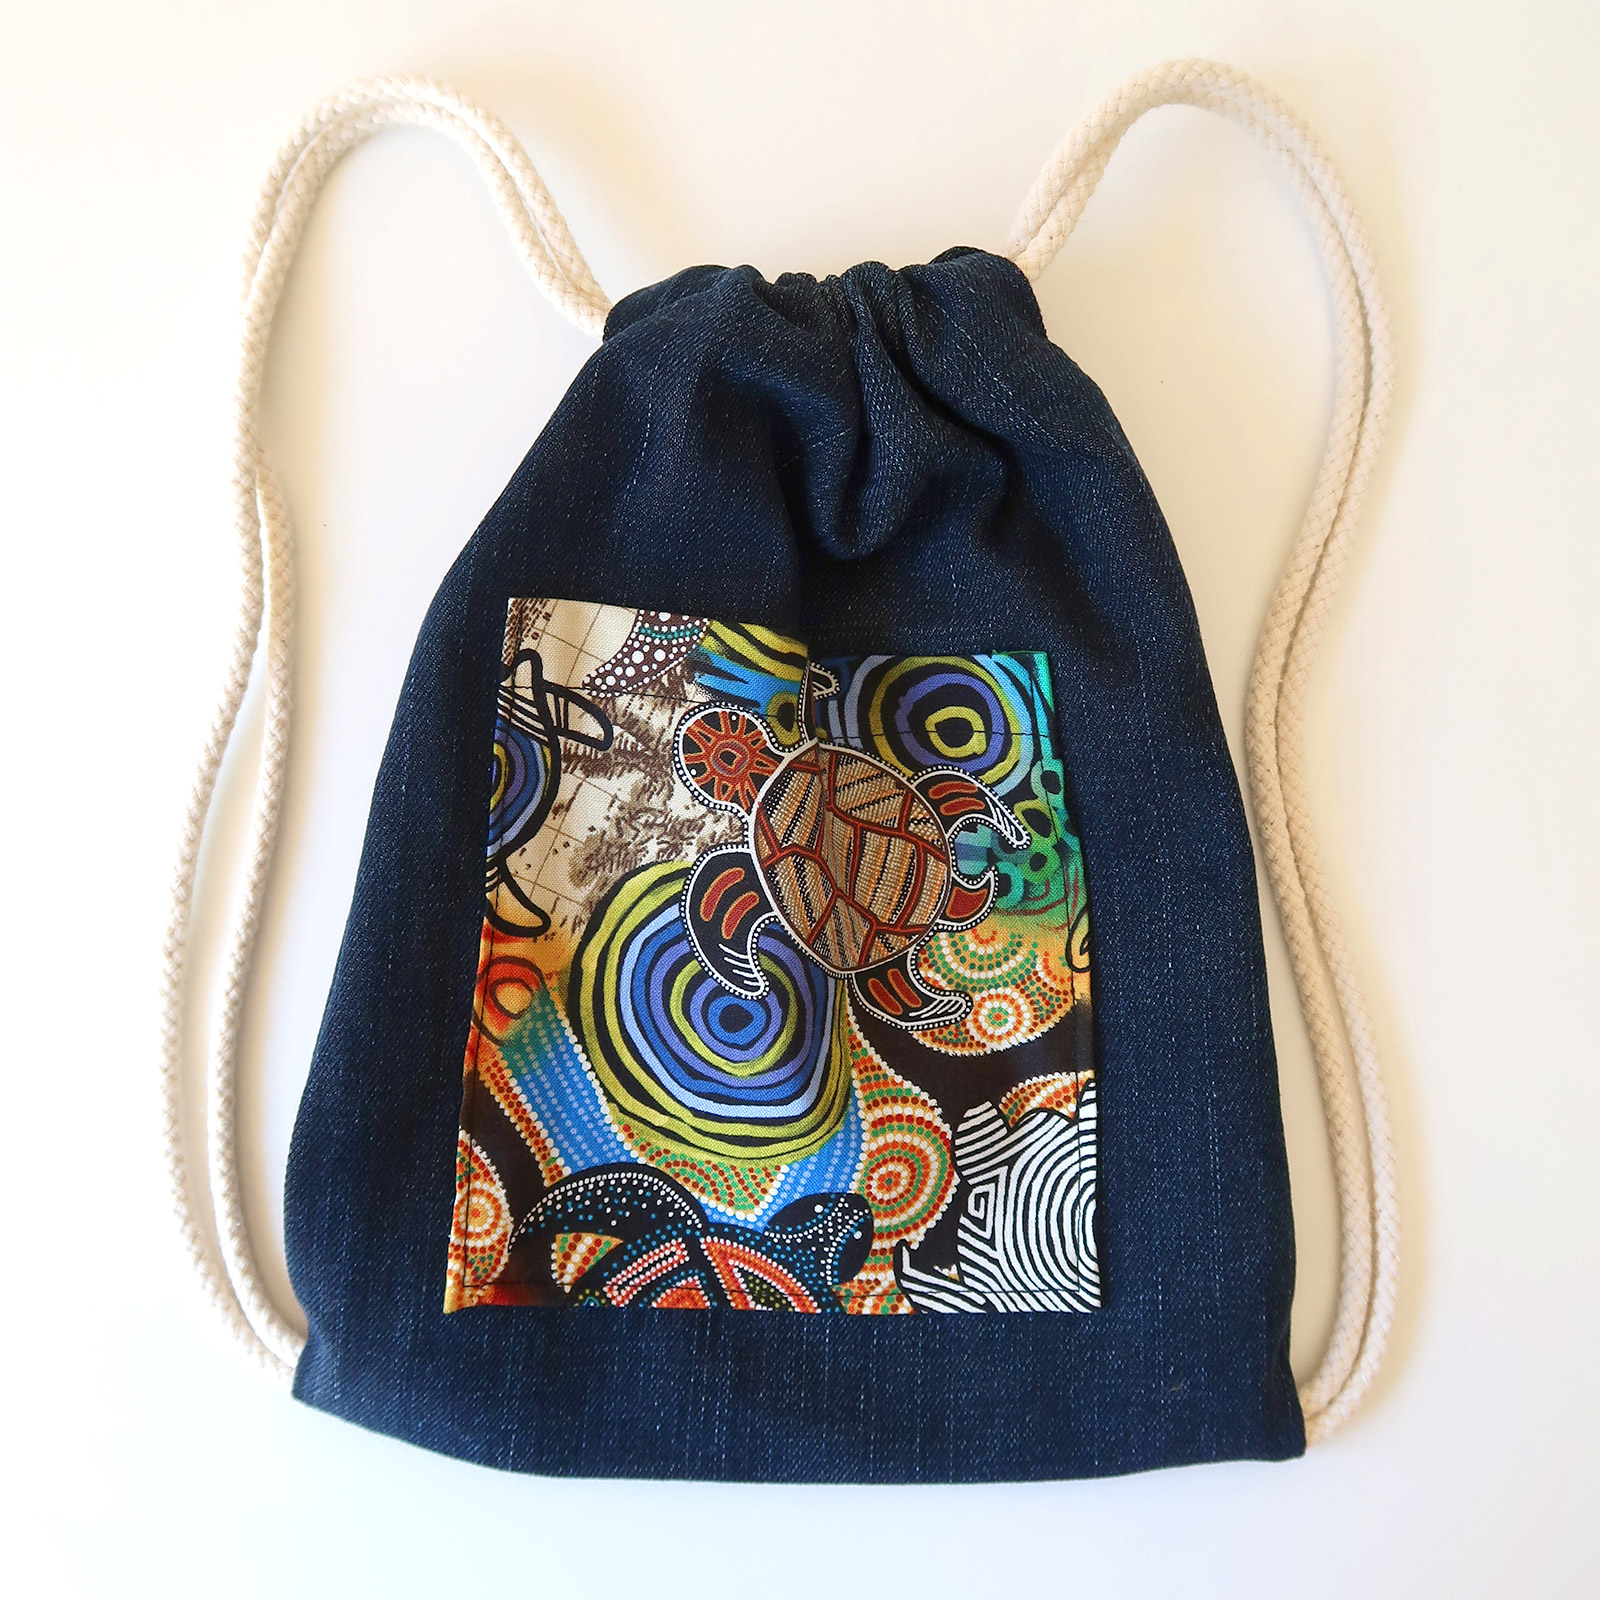 Drawstring bag for a toddler